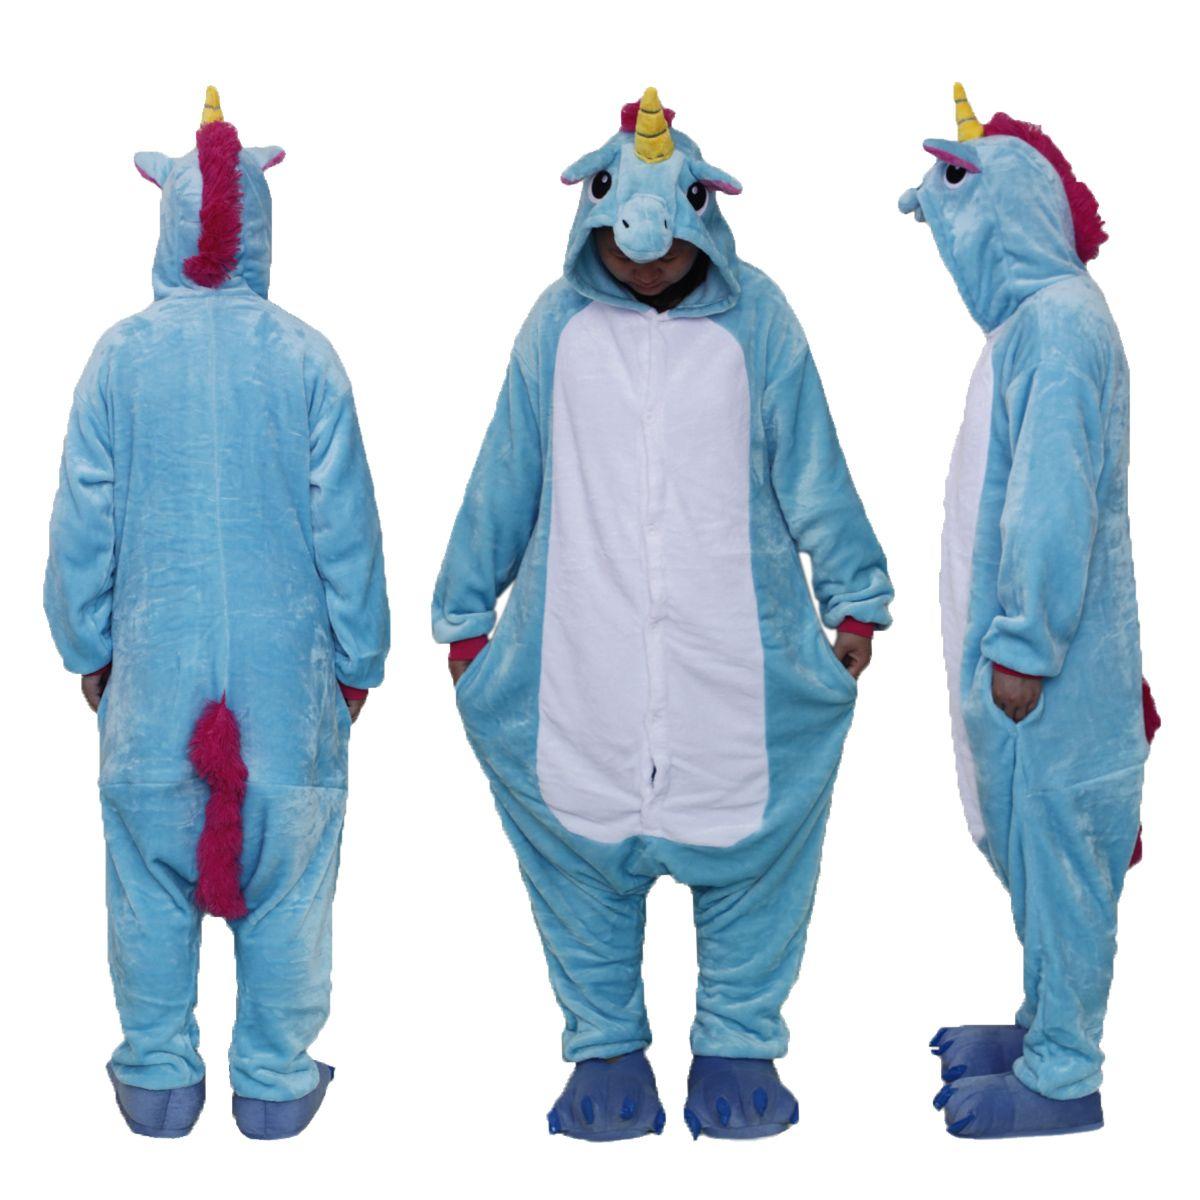 Unisex Adulto Animal Navidad Onesie Pijamas Cosplay Costume Loungewear